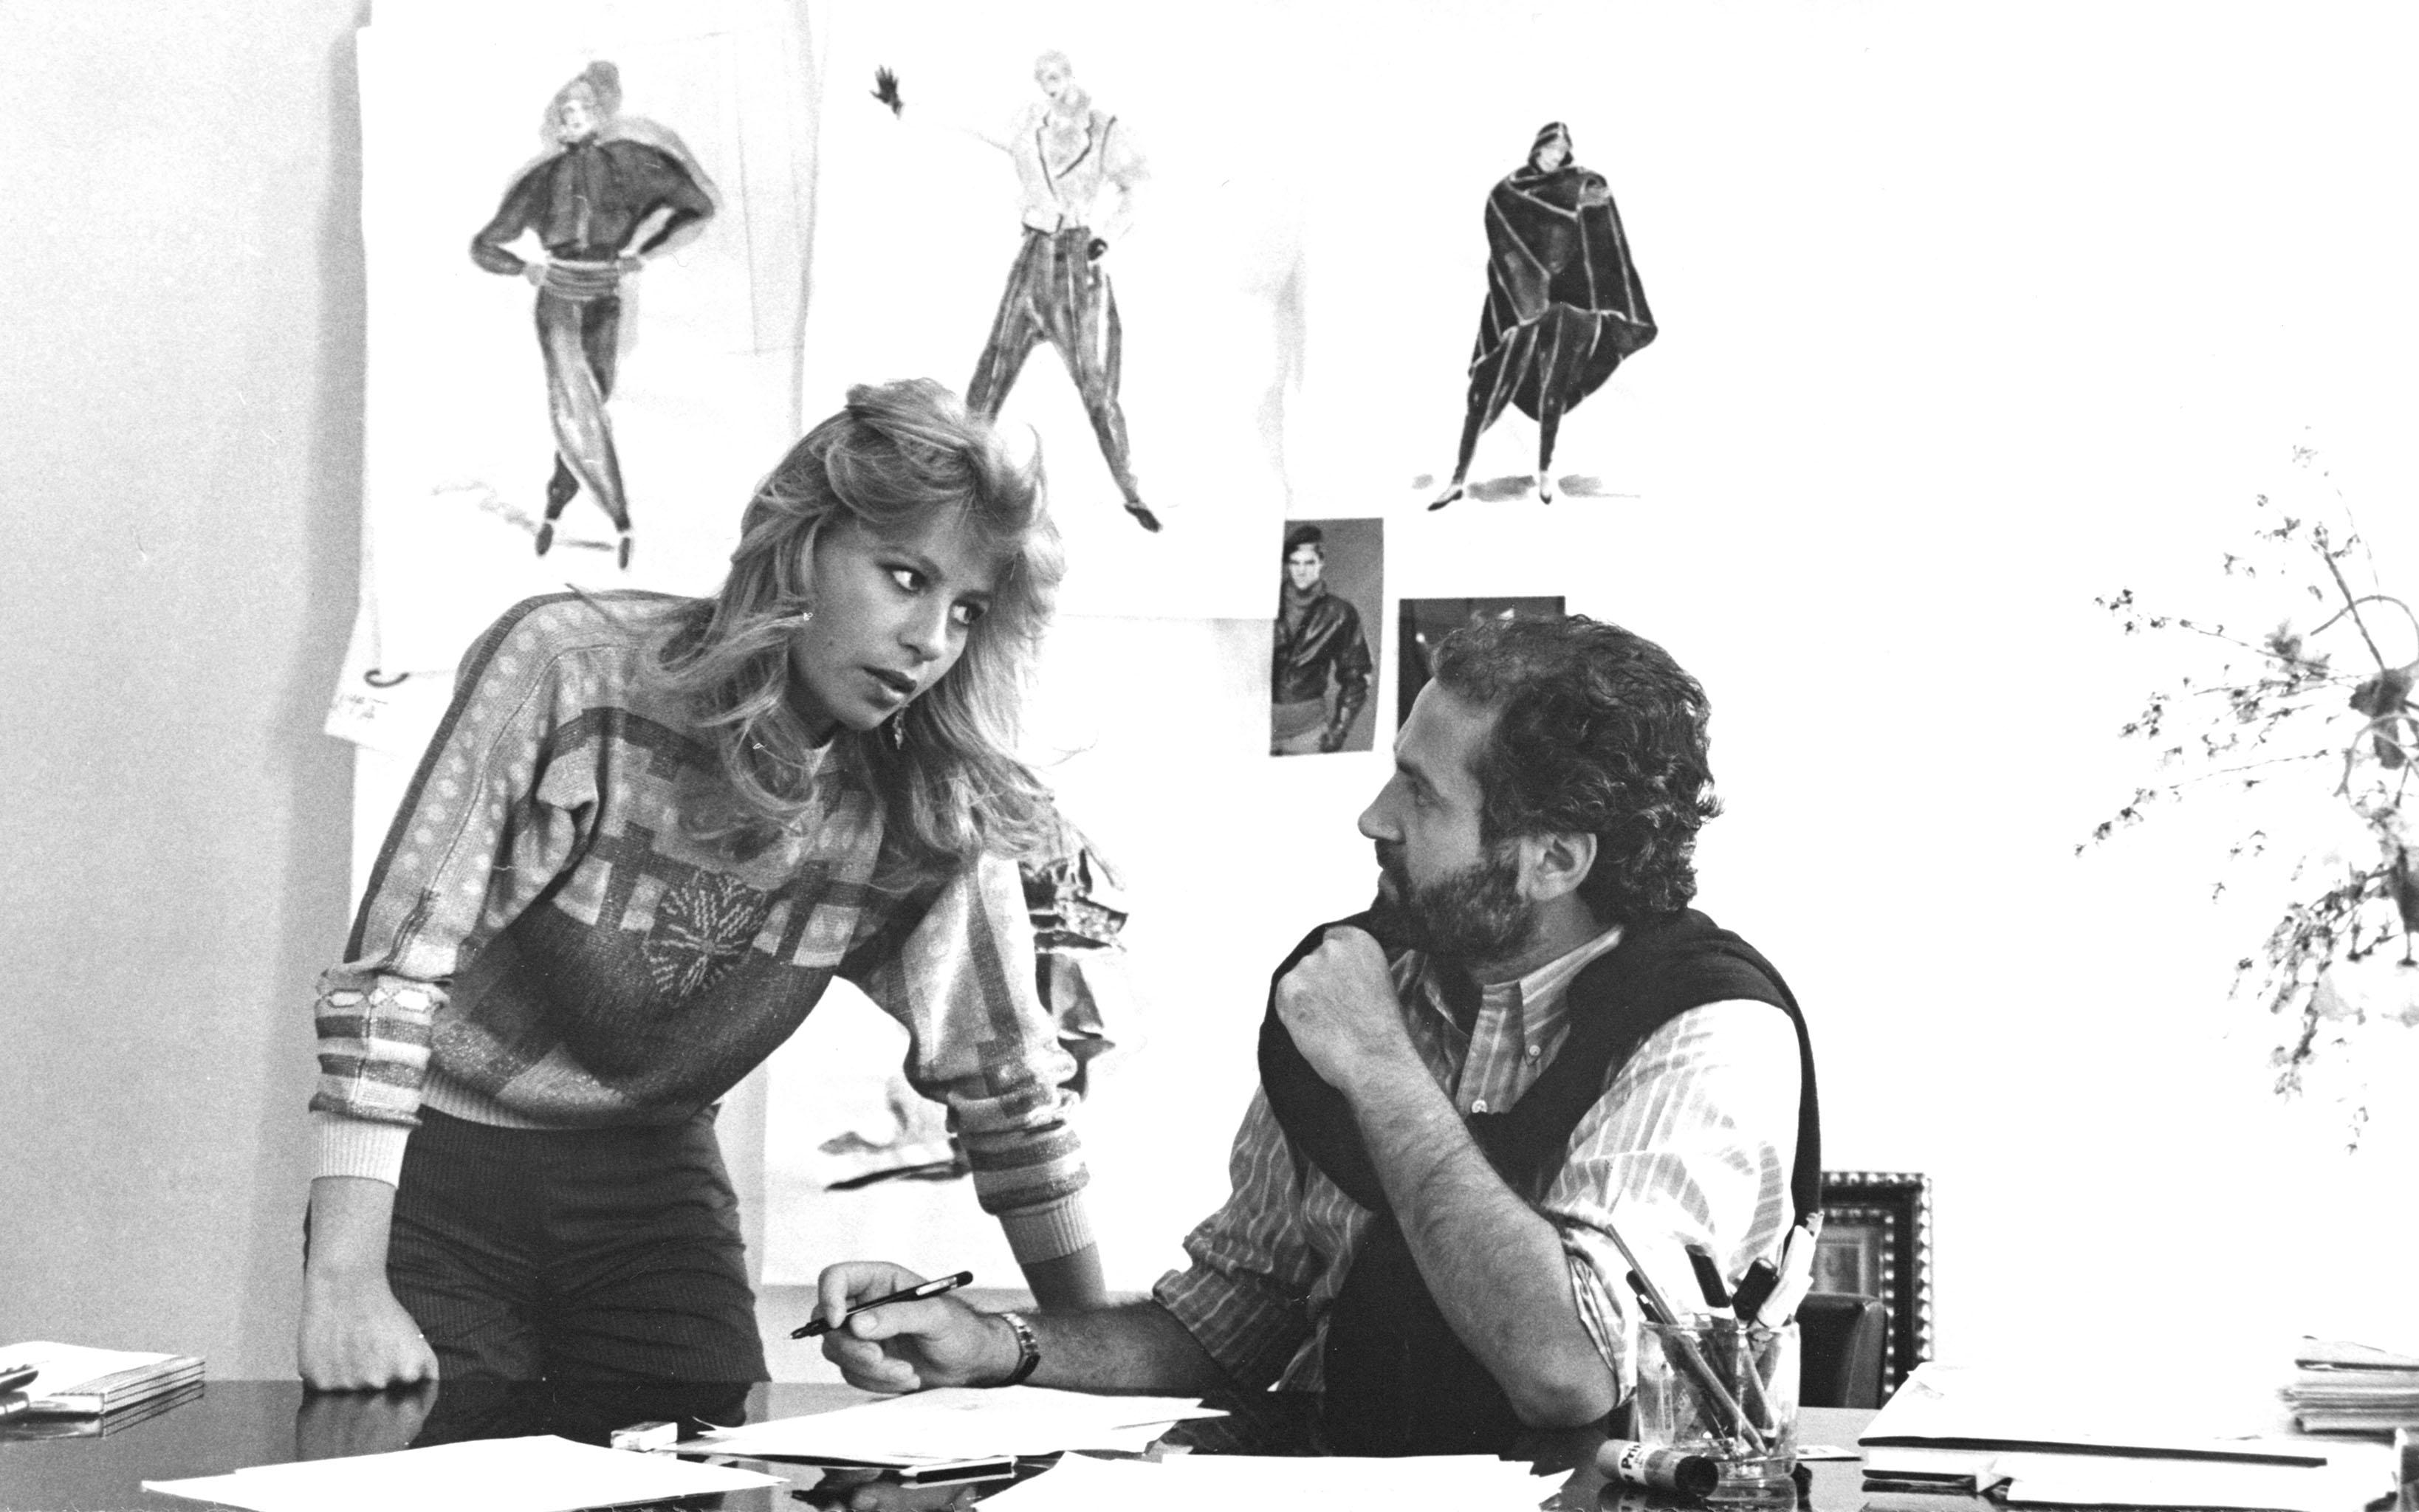 Donatella and Gianni Versace